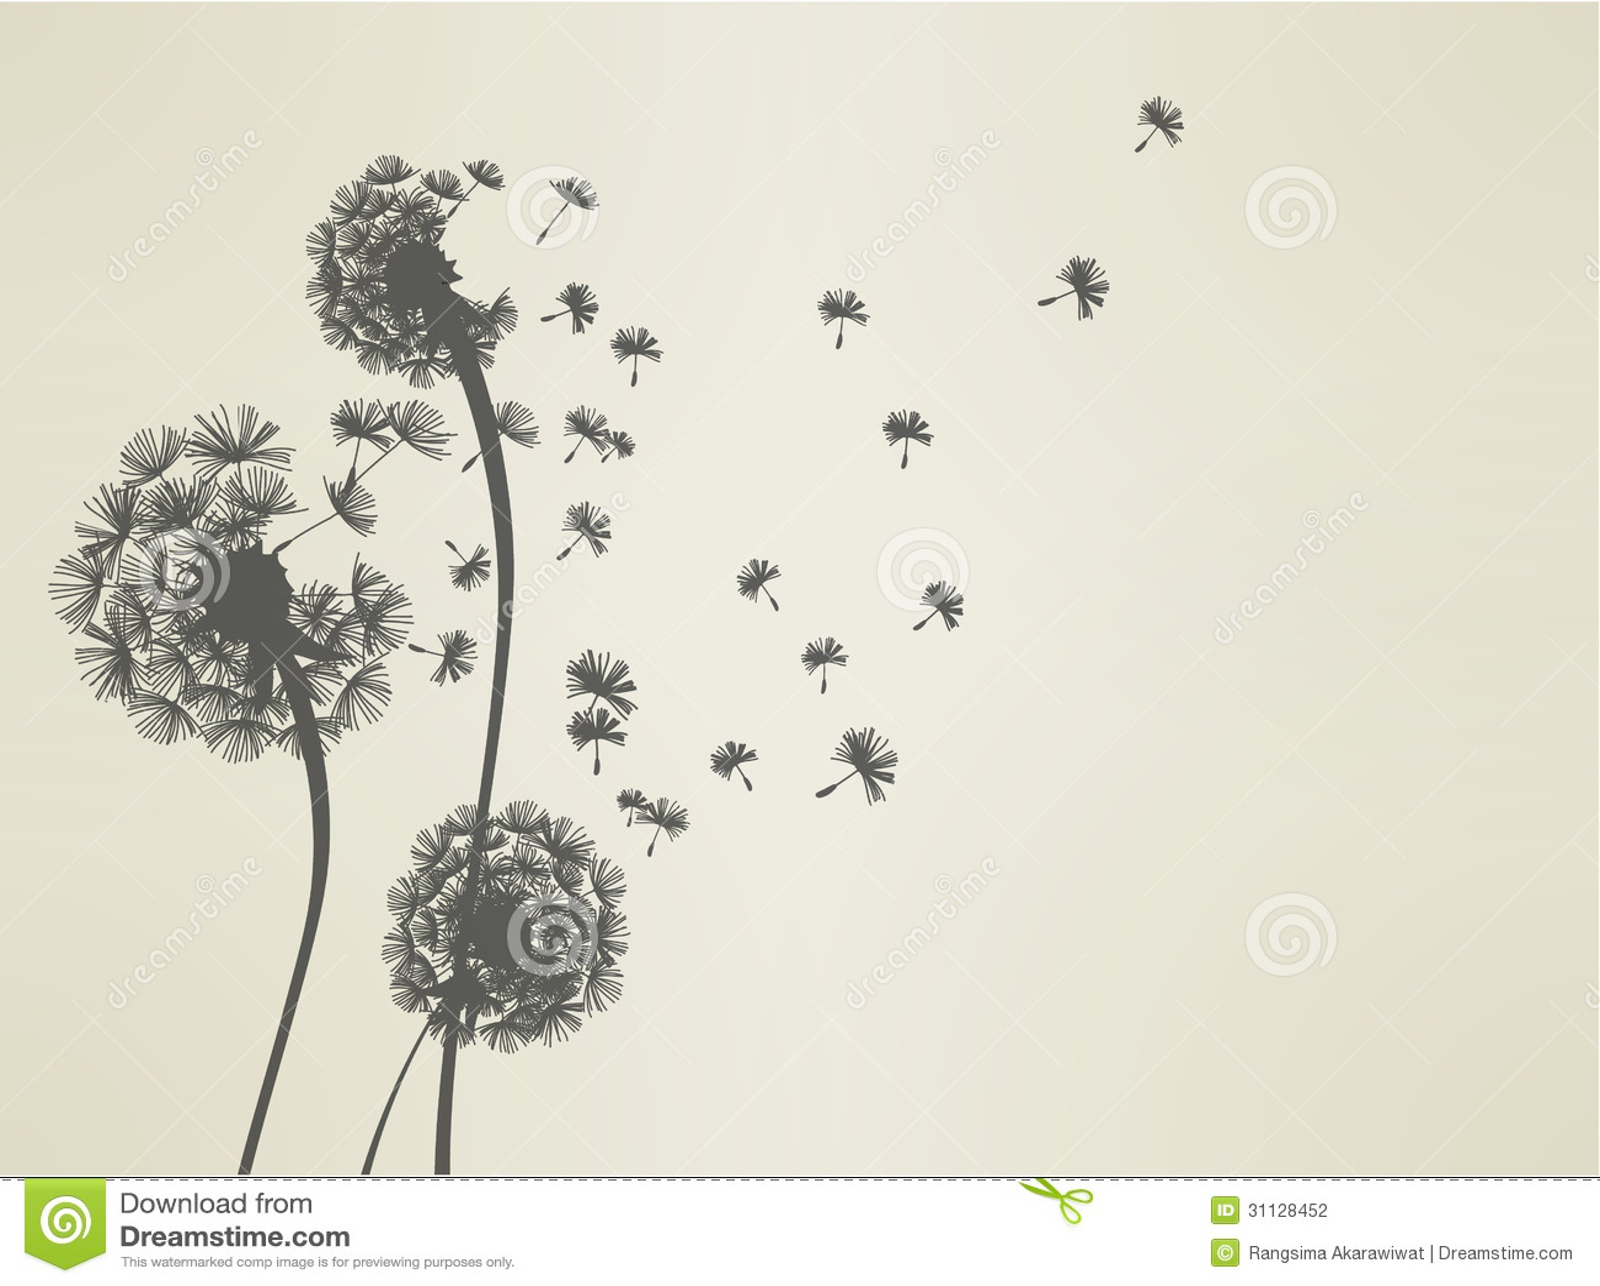 Dandelion Stock Photography - Image: 31128452